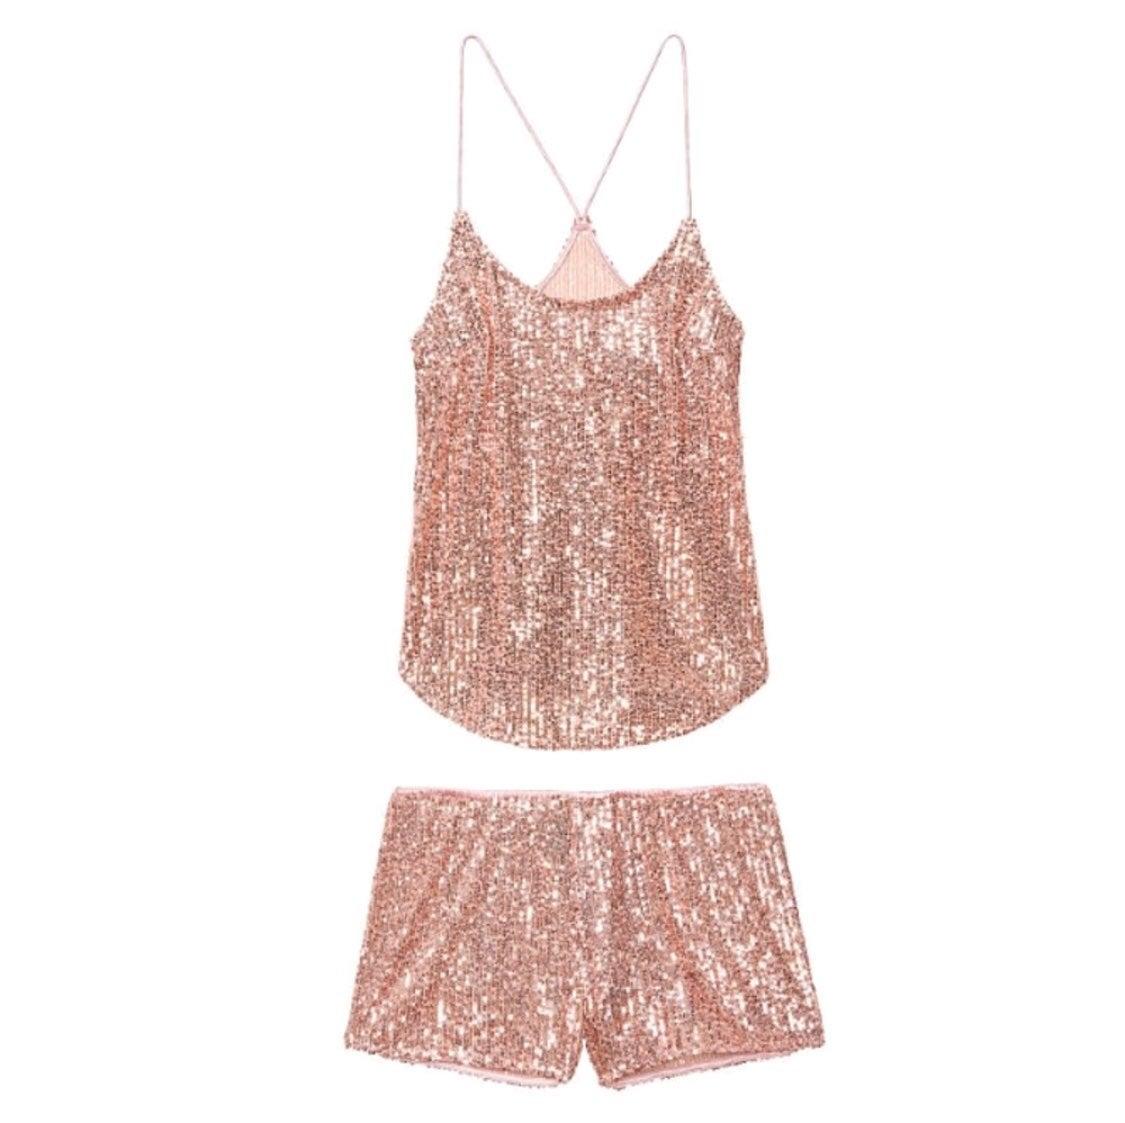 NWT Victoria's Secret Rose Gold Sequins